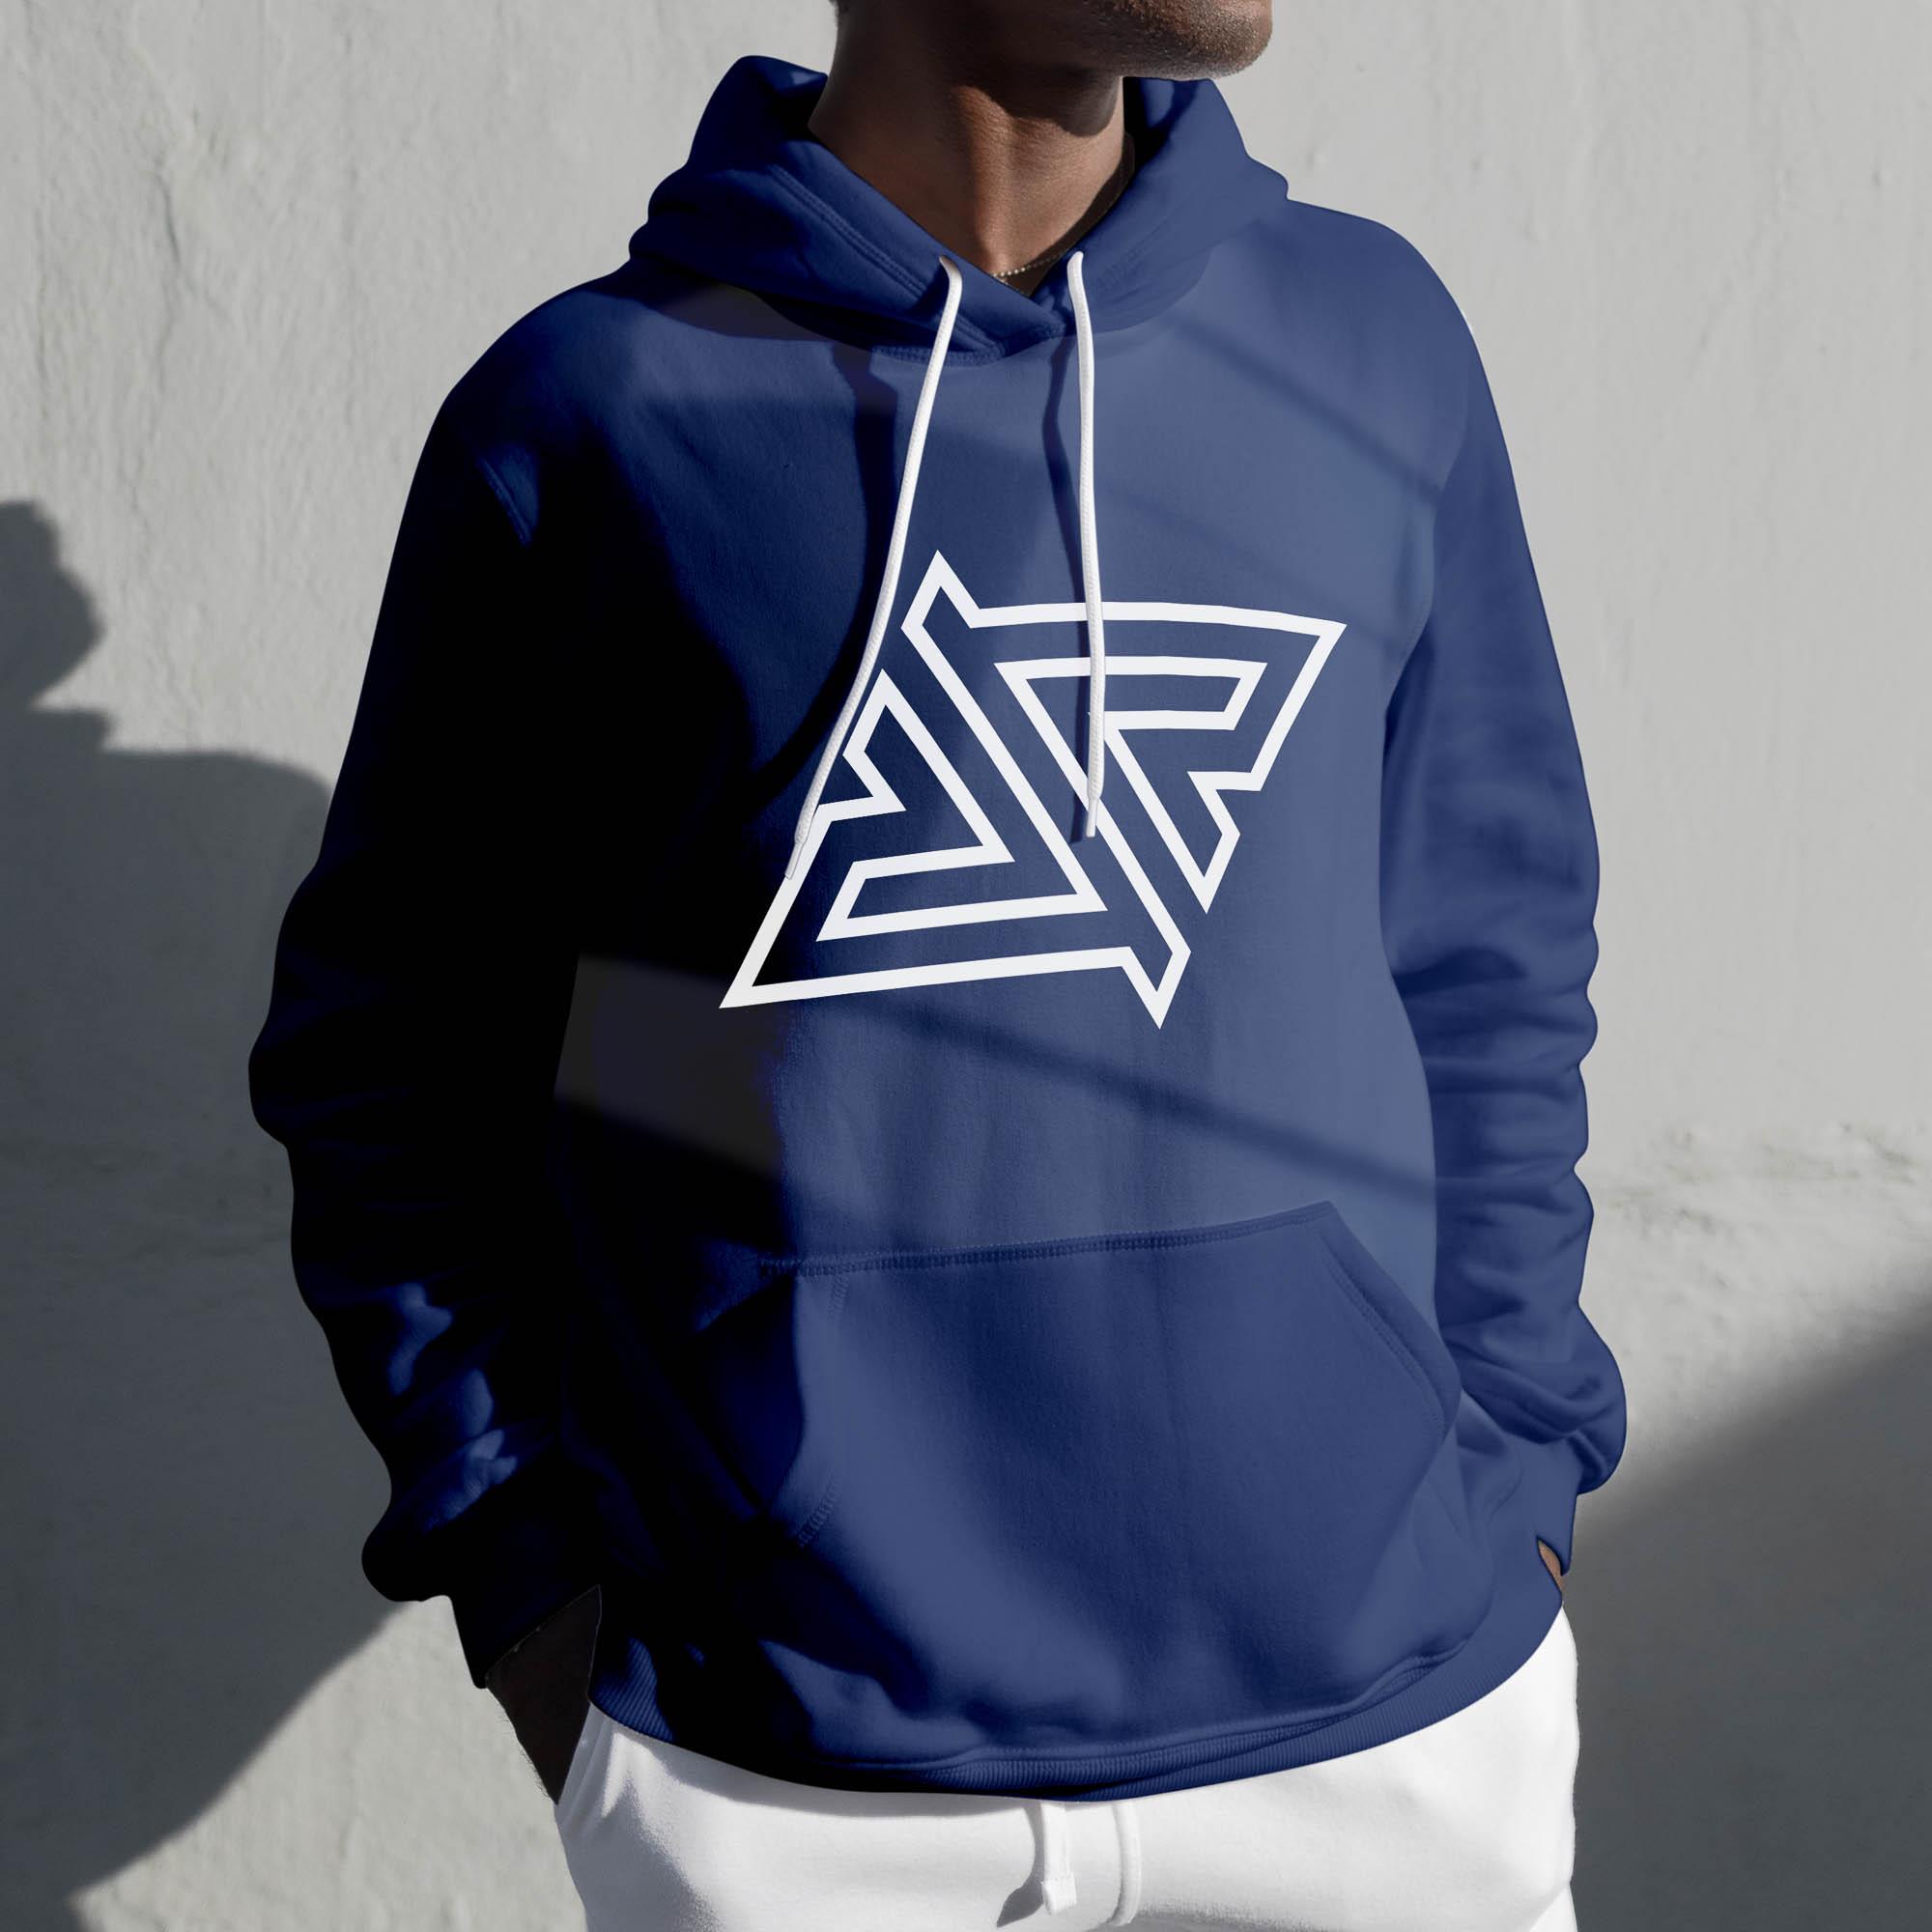 Royal Five - Logo MockUp - Hoodie Blue Reflected